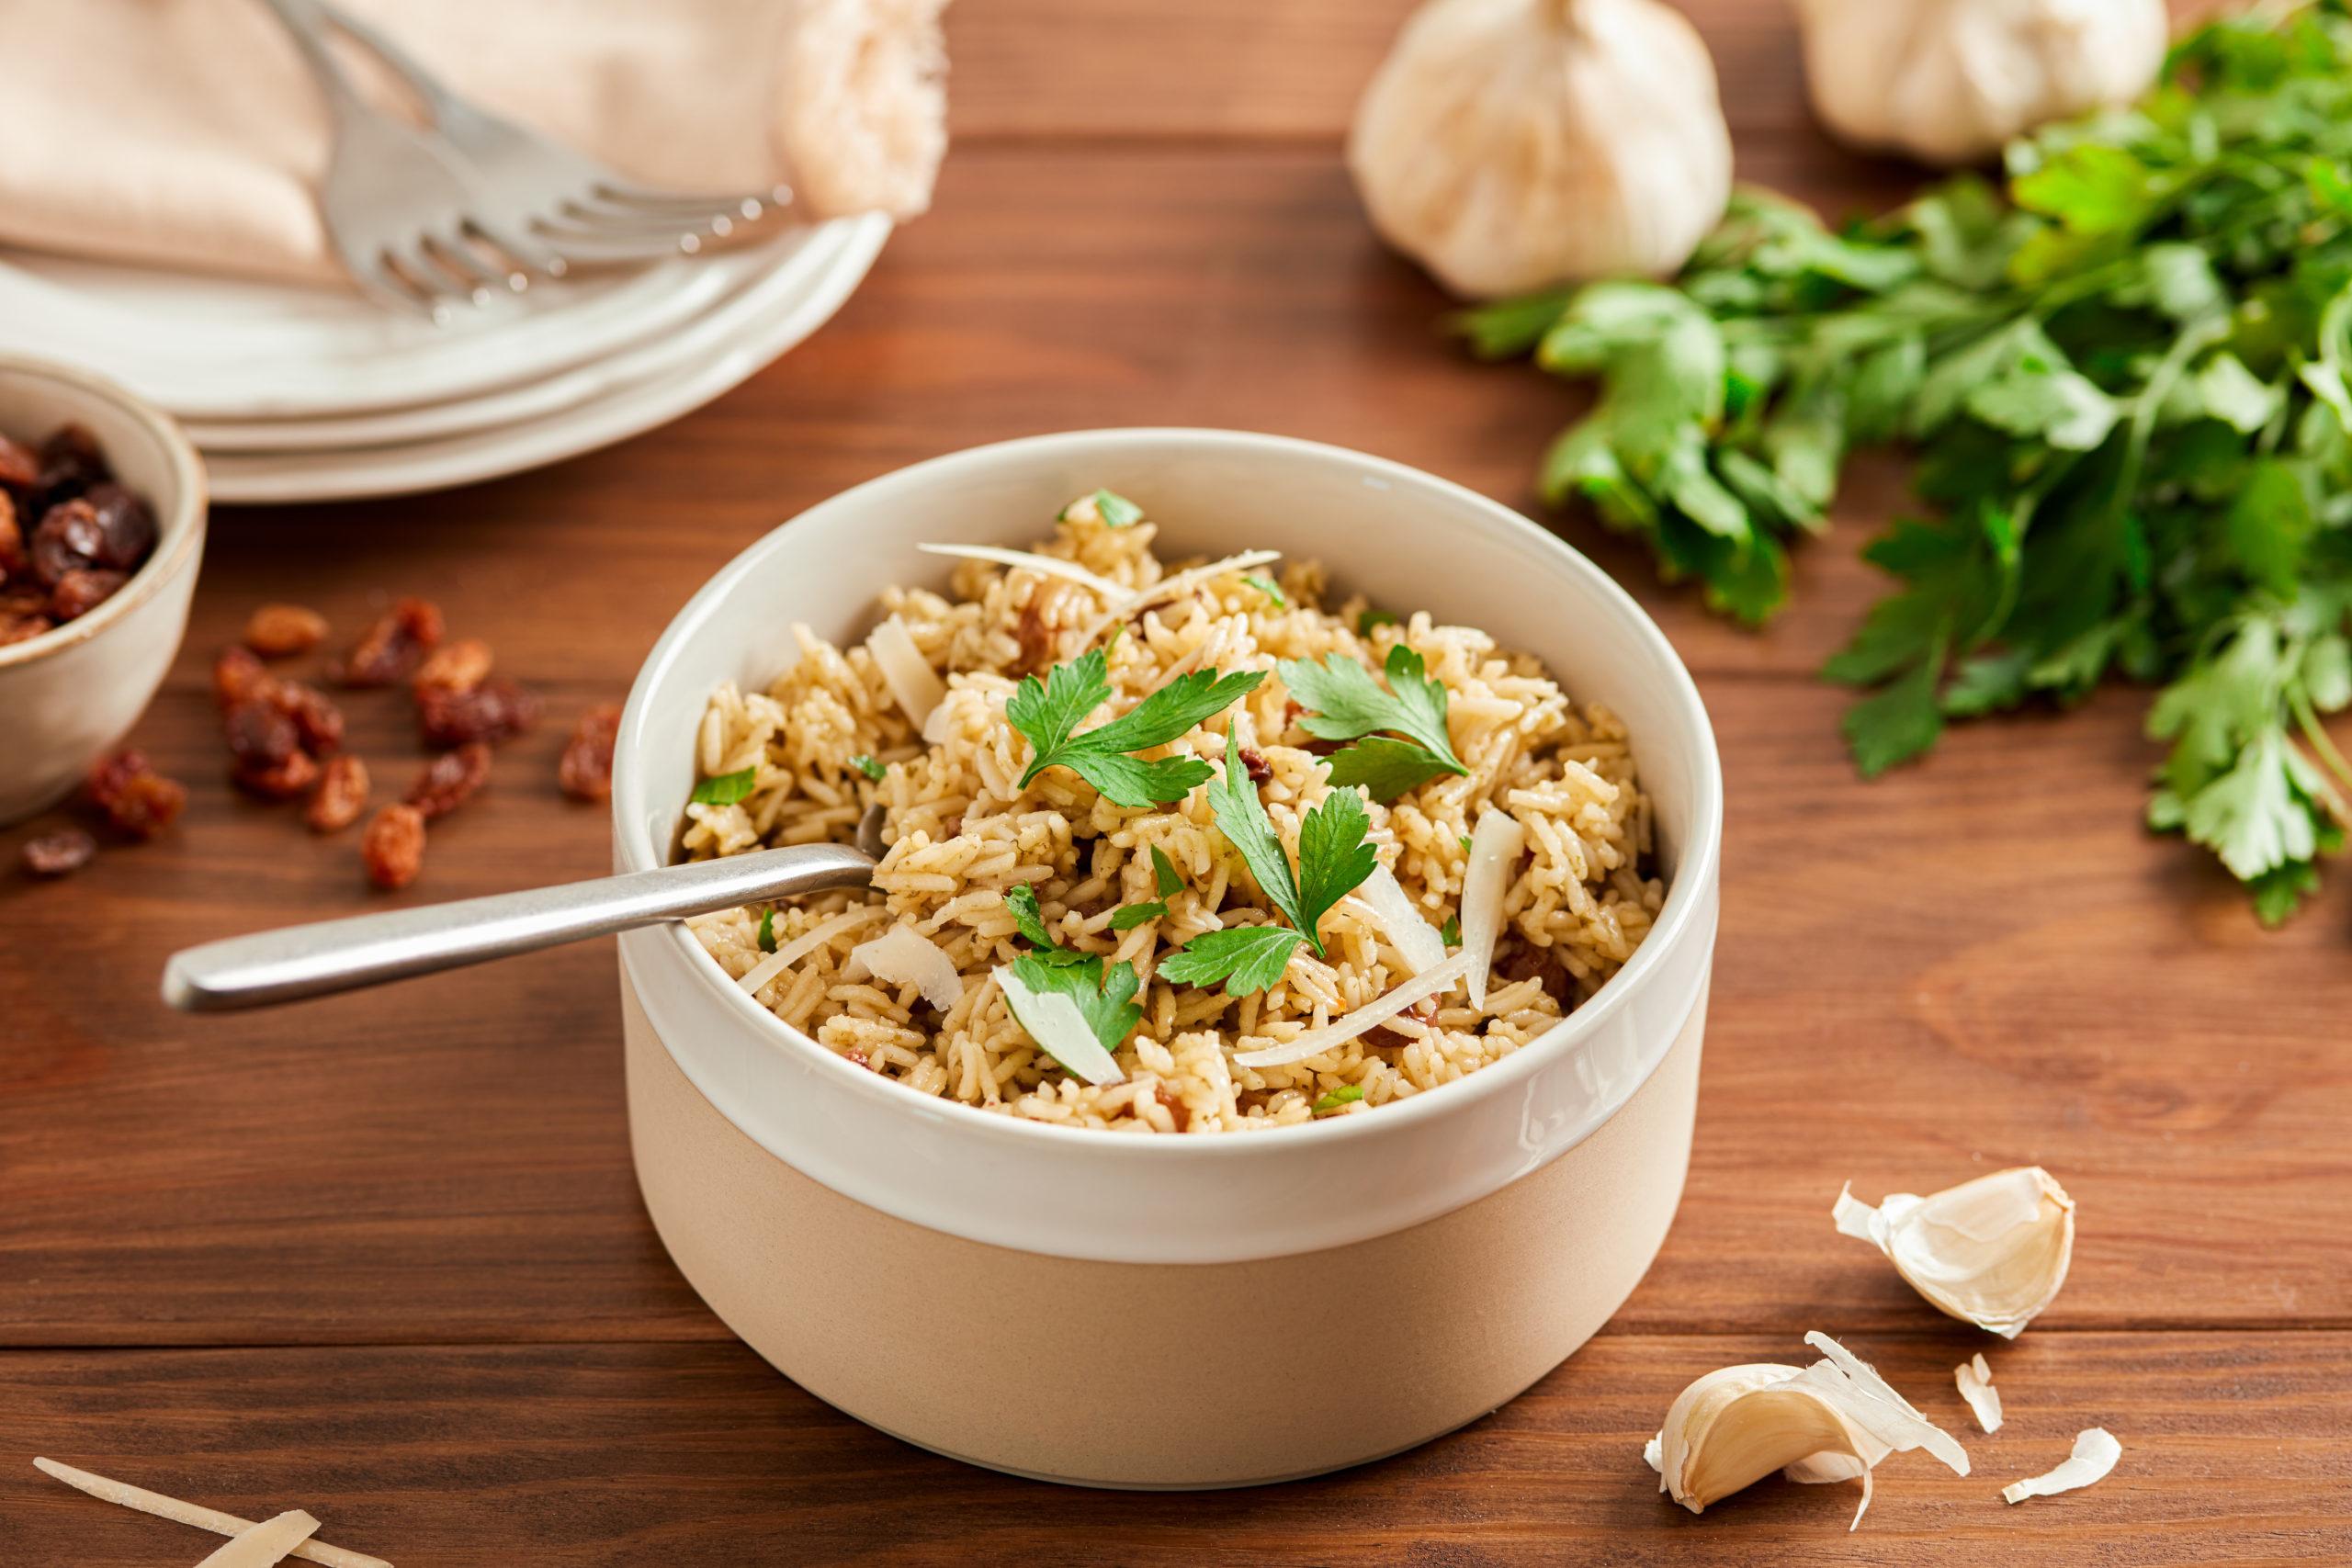 Italian Rice with Raisins (Riso coll' Uvetta)